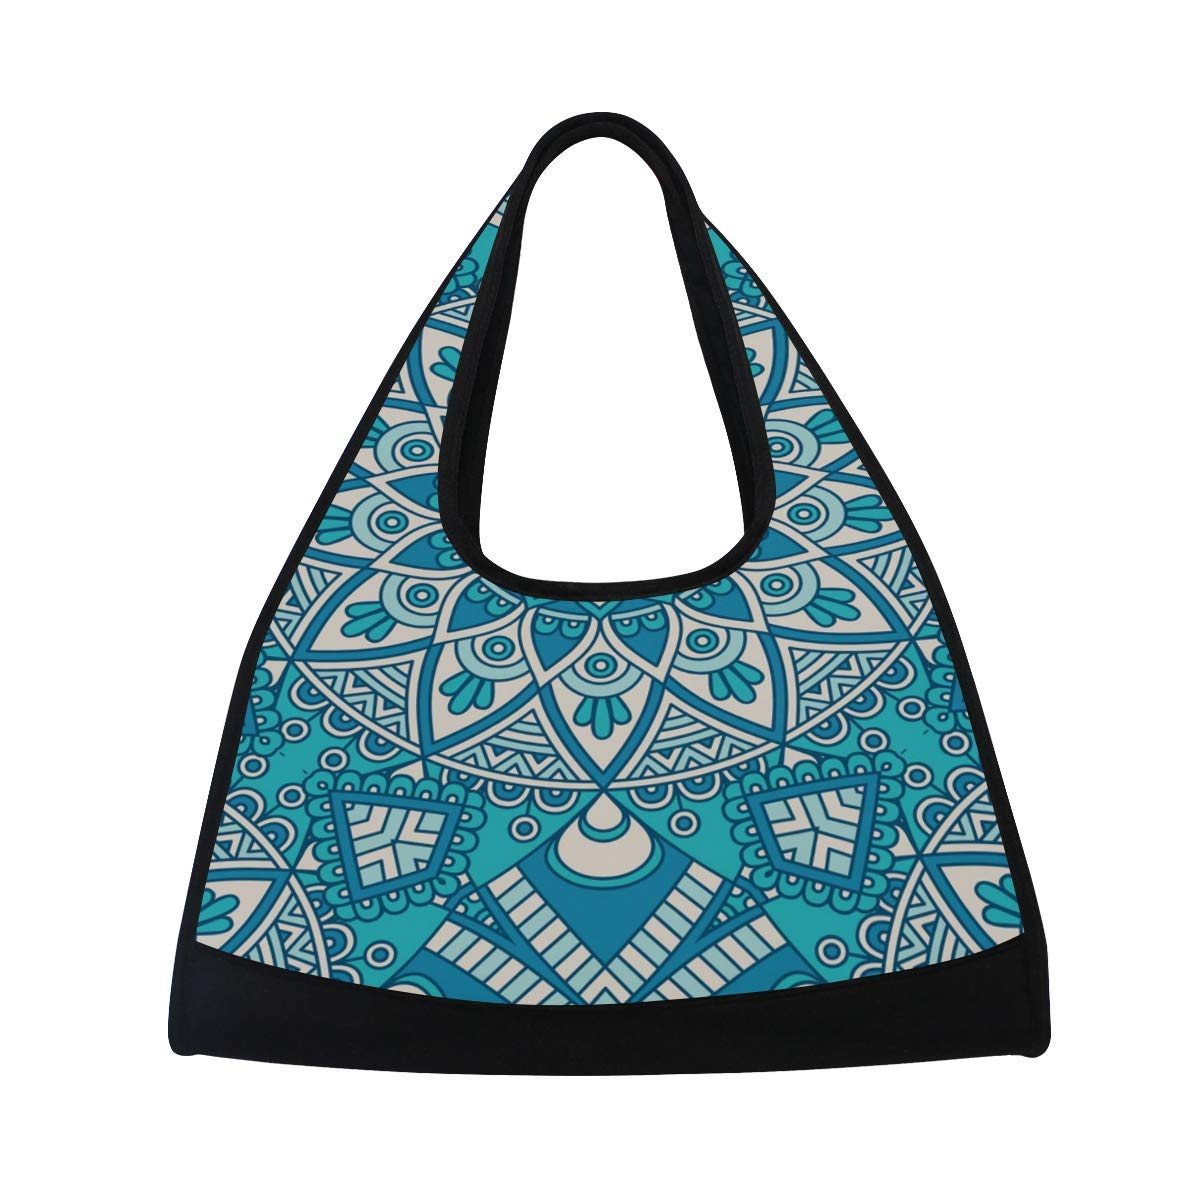 Boho Style Floral Texture Women Sports Gym Totes Bag Multi-Function Nylon Travel Shoulder Bag